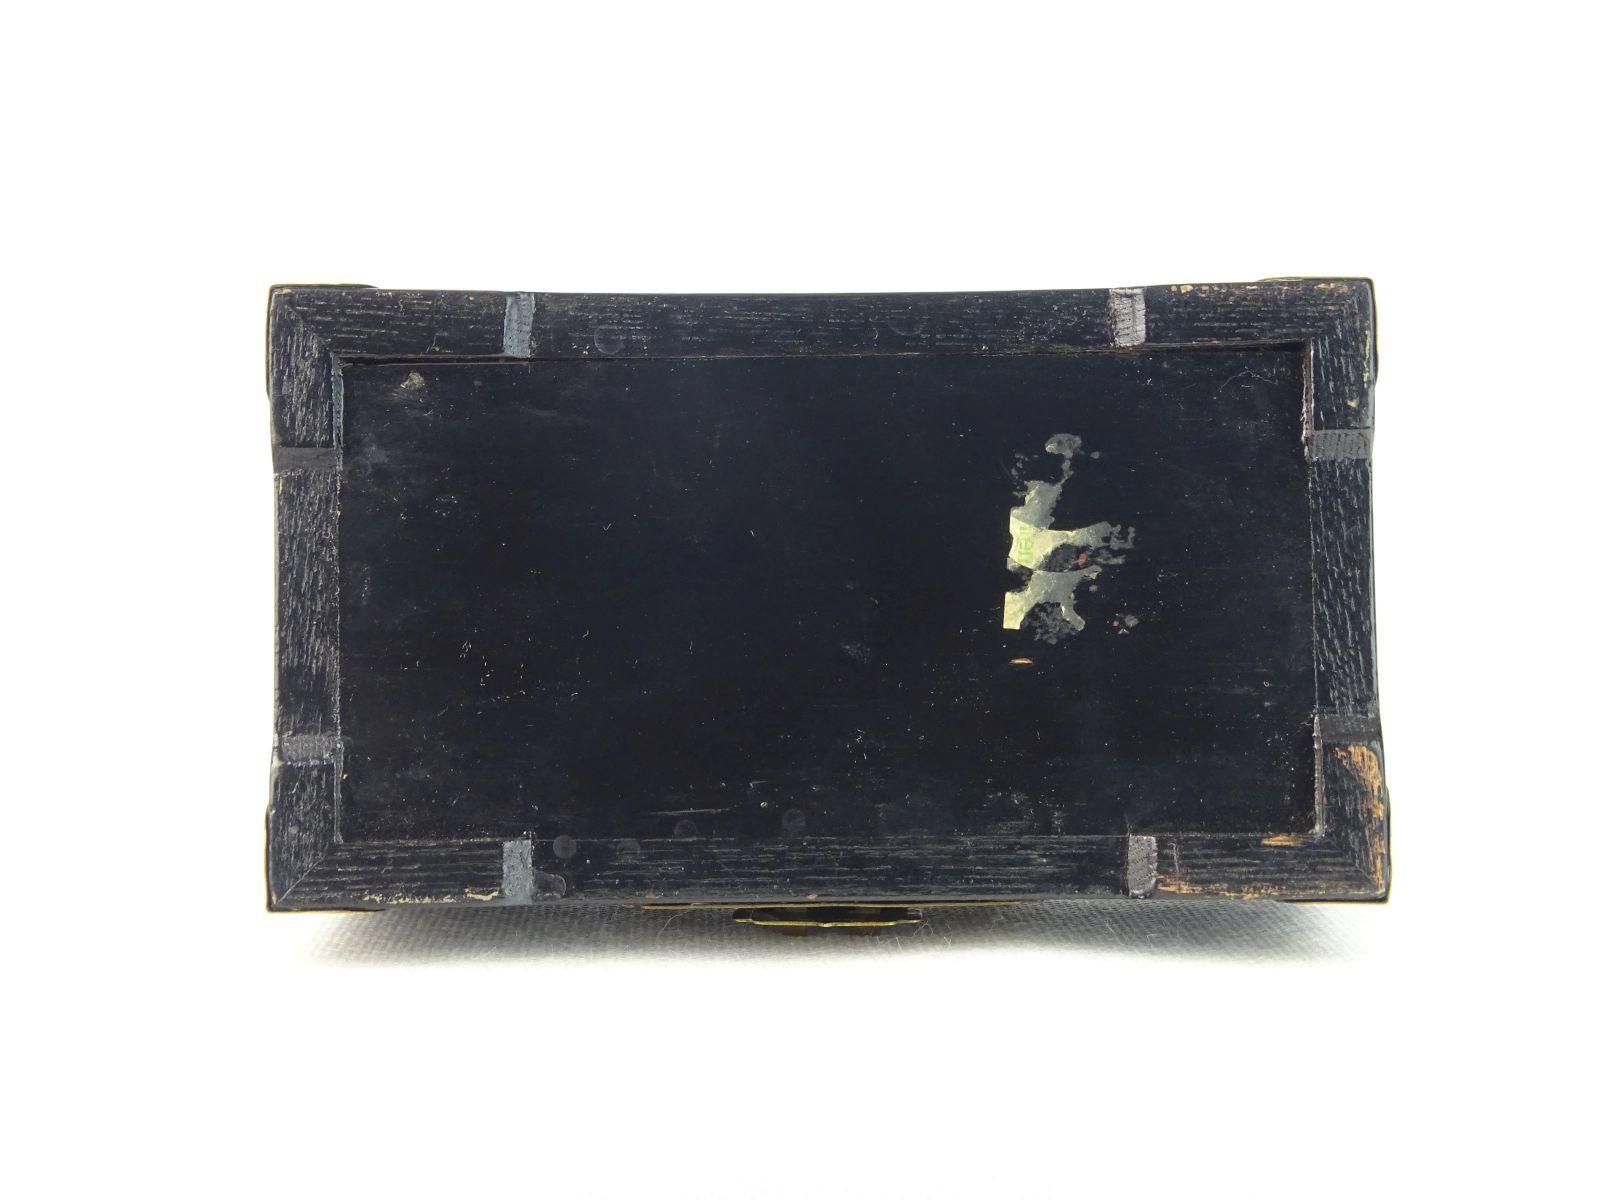 DSC08945.JPG (1600×1200)